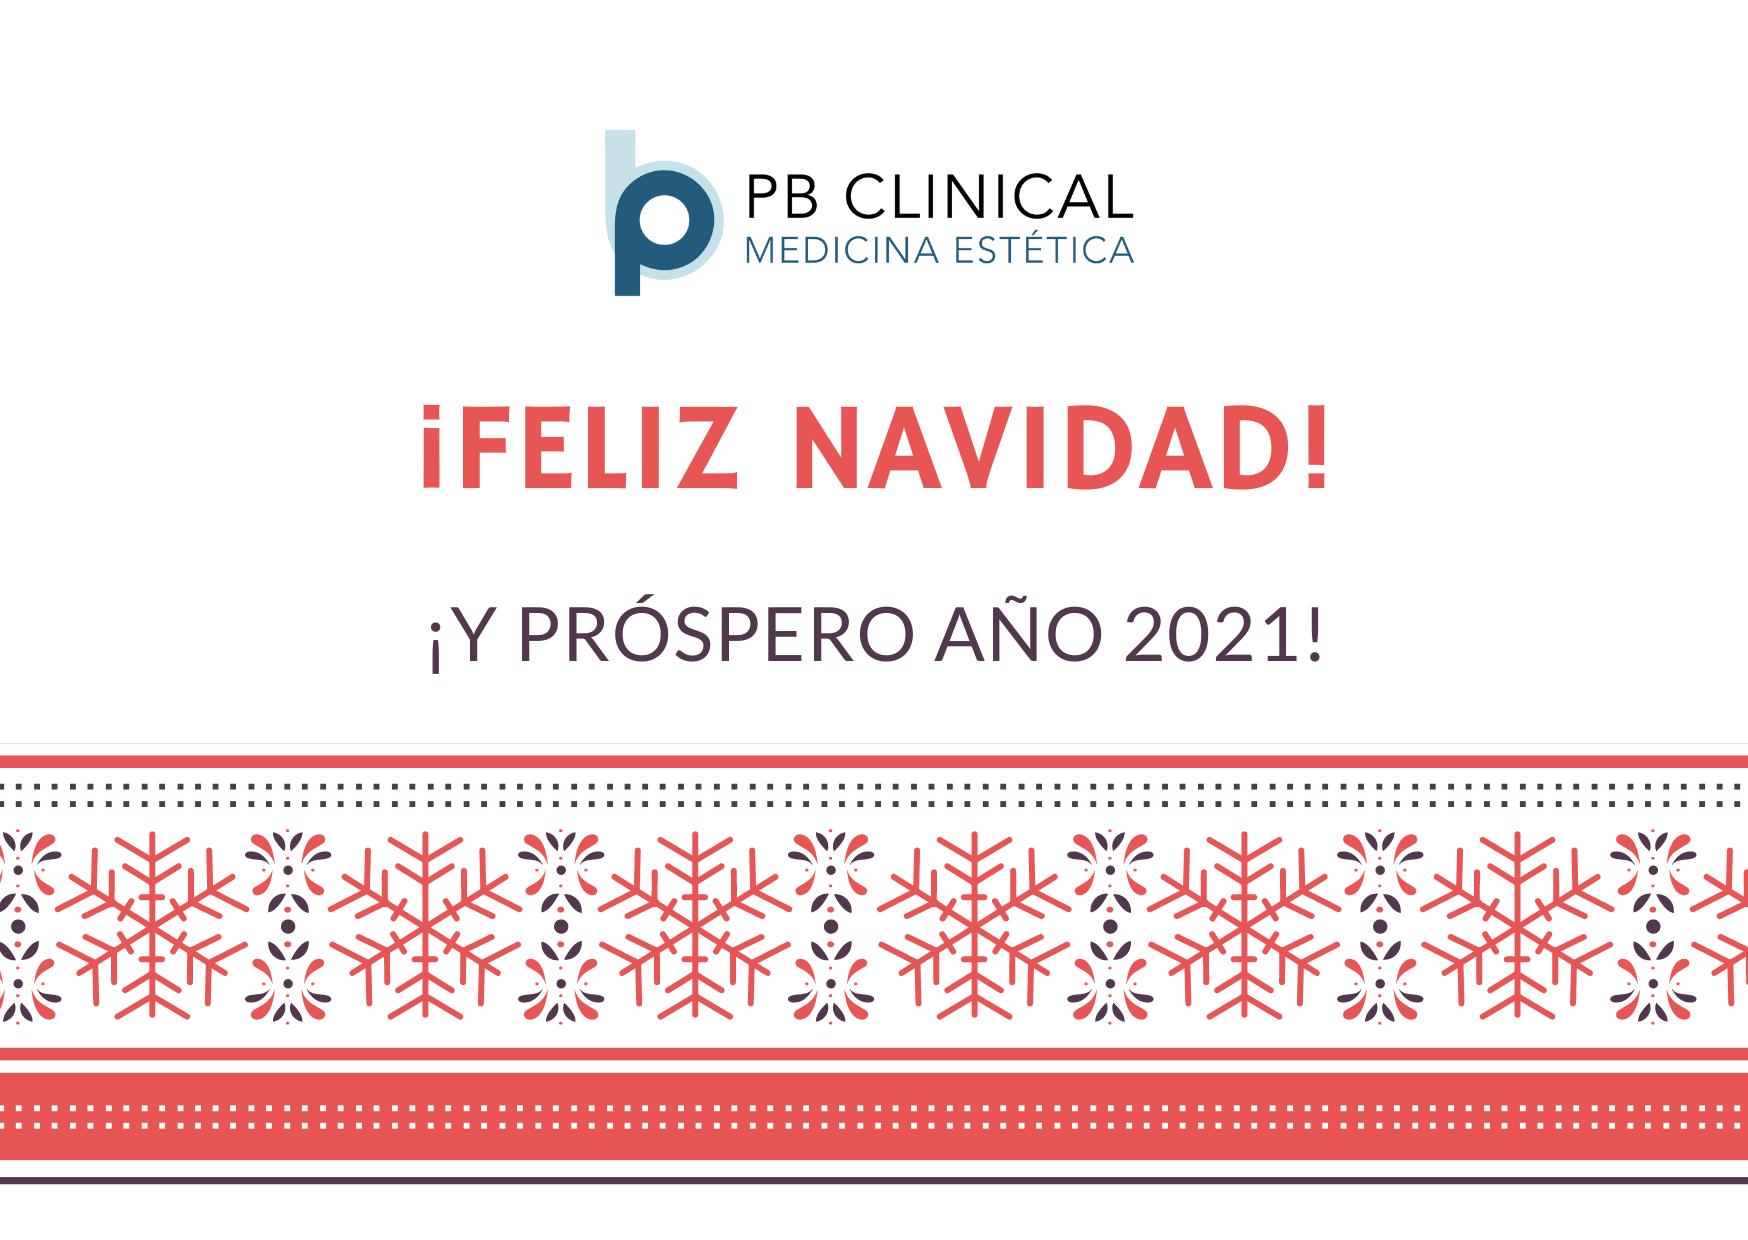 Christmas 2021 PB Clinical